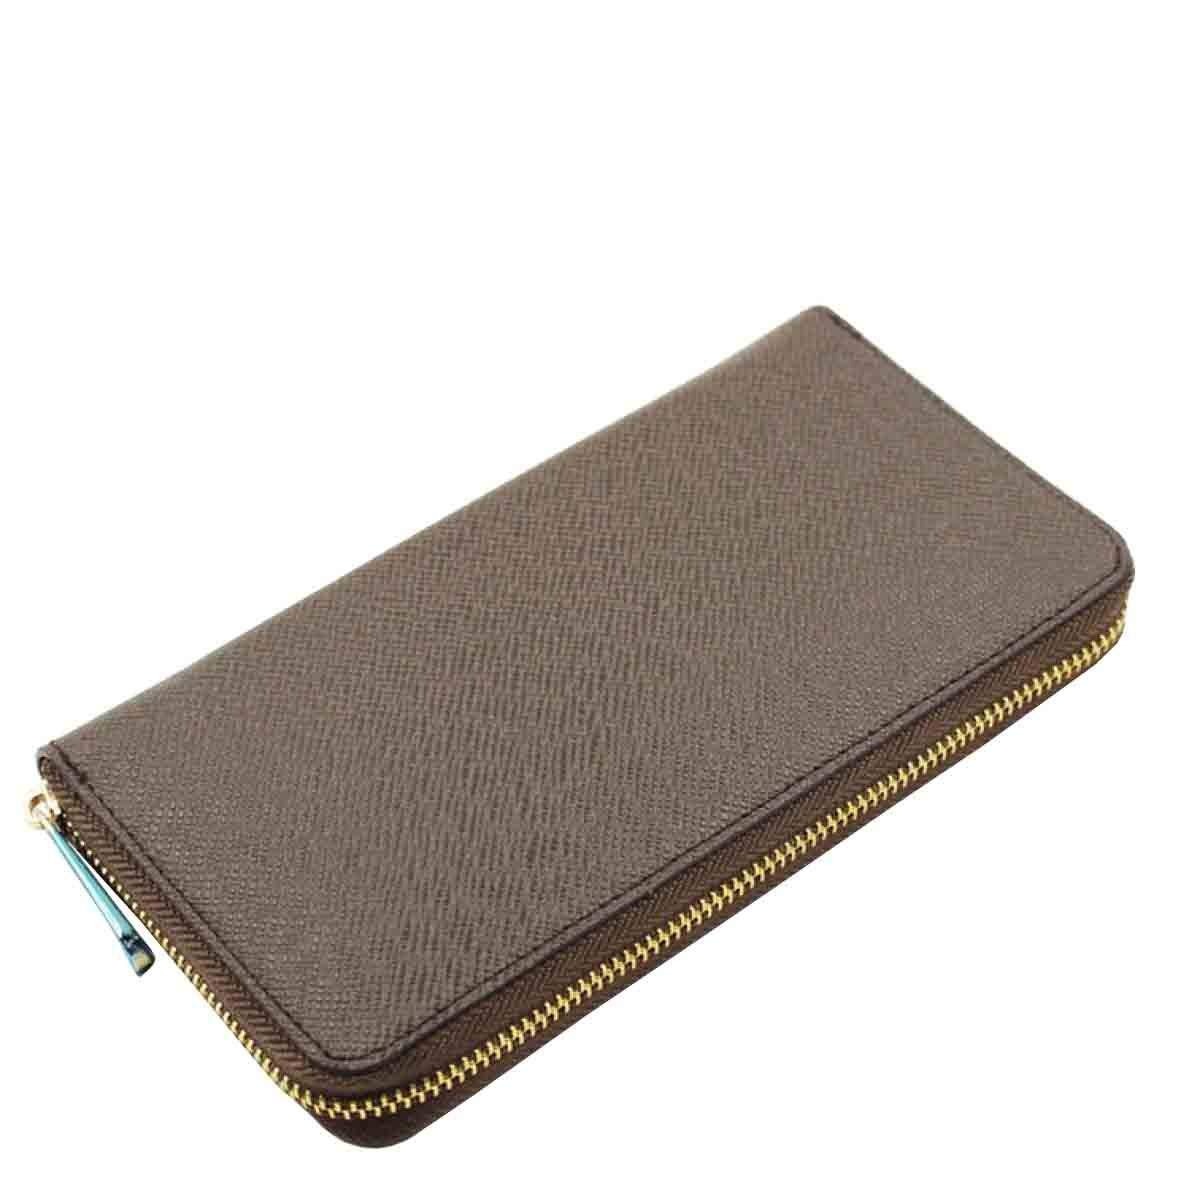 Beige Cross Women Large Capacity Leather Zipper Wallet Purse Wristlet Handbag with for Work (color   Beige, Size   One Size)